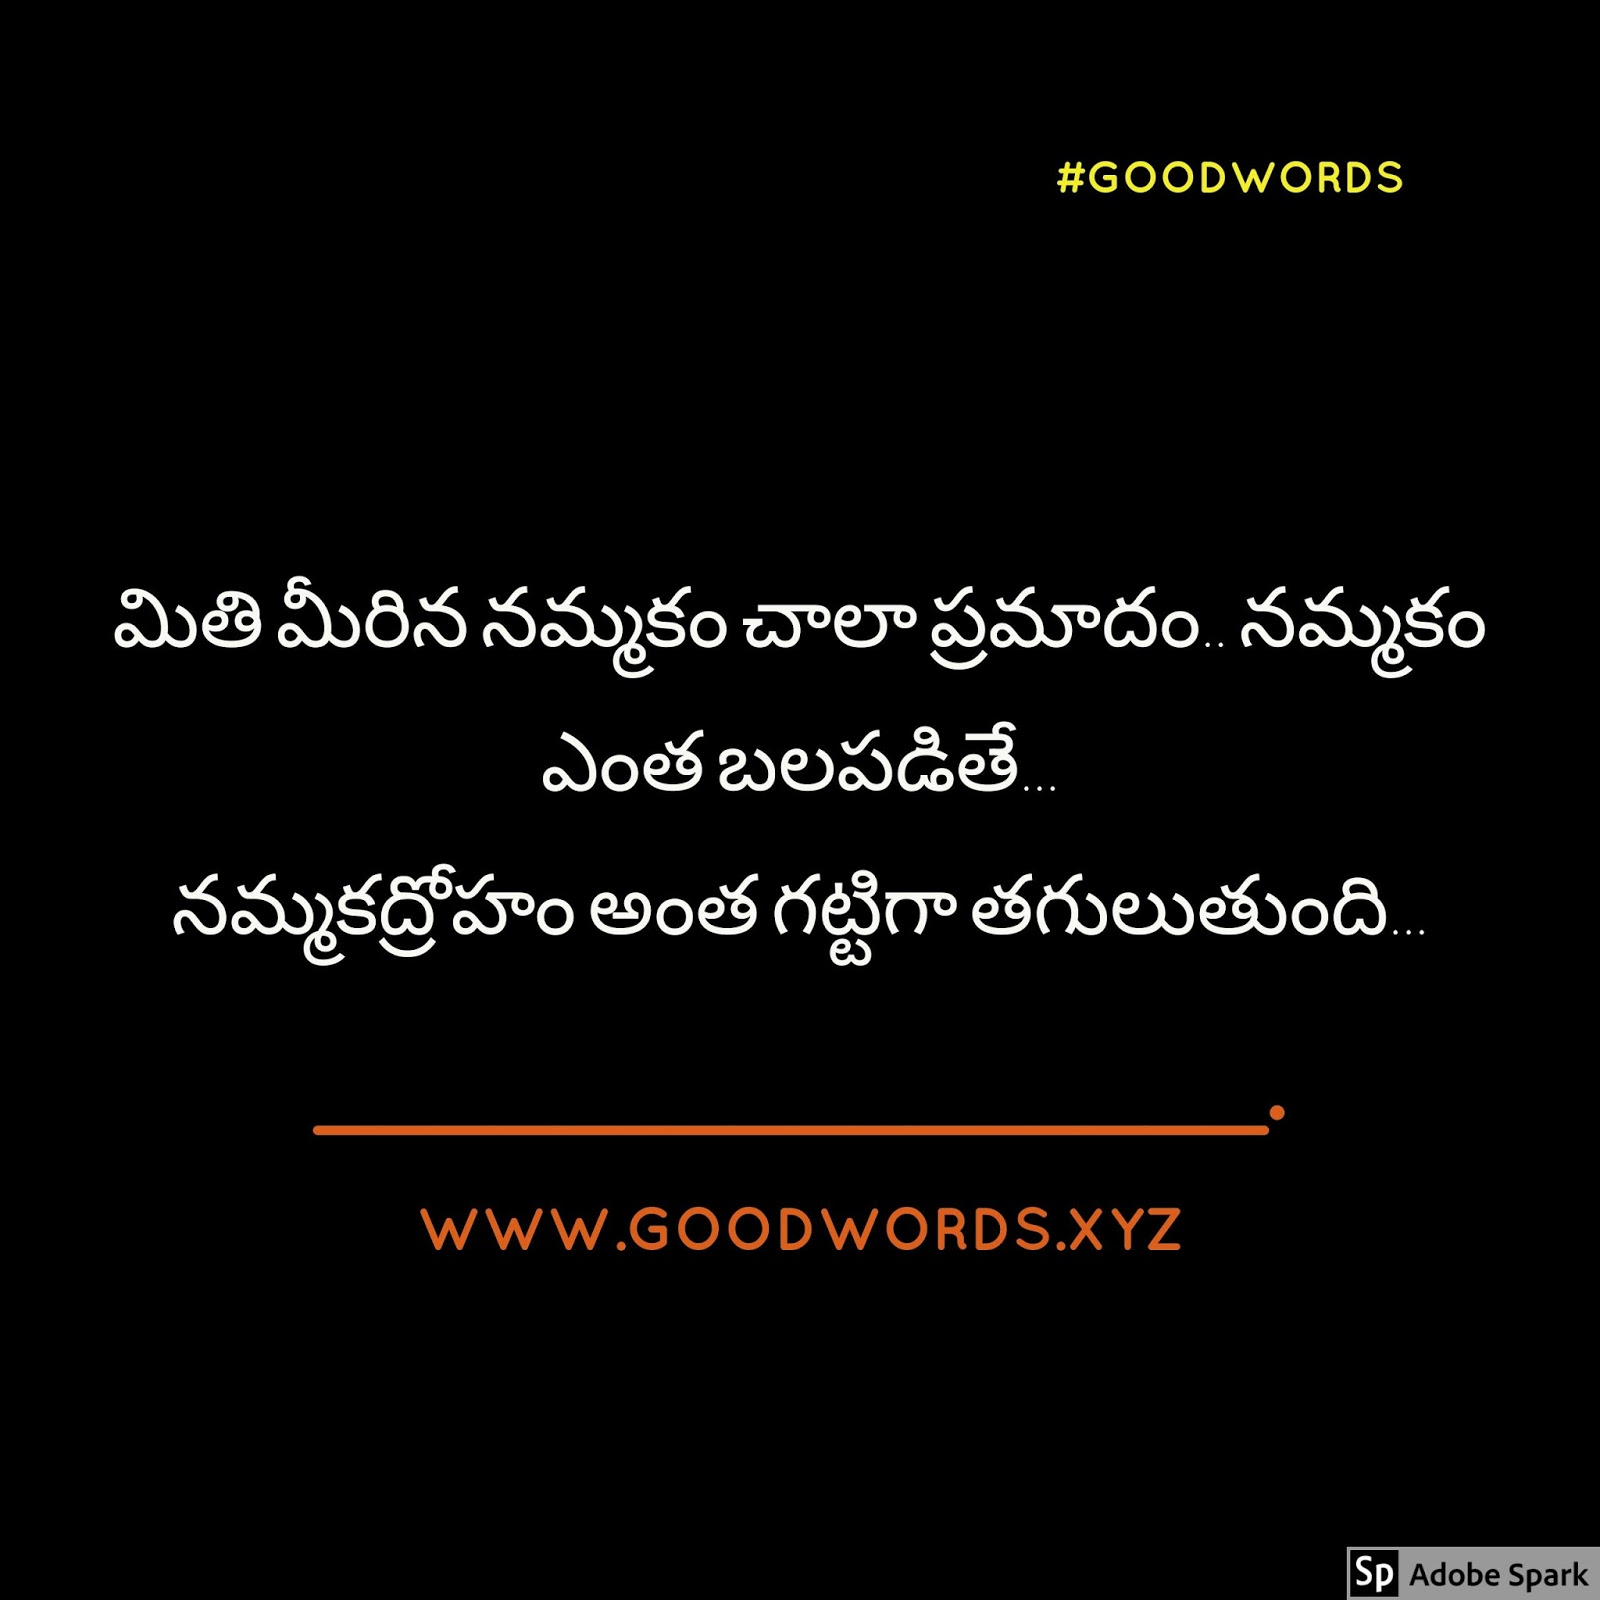 Good Motivational Quotes Telugu Good Motivational Quotes On Trust  Good Wordsxyz